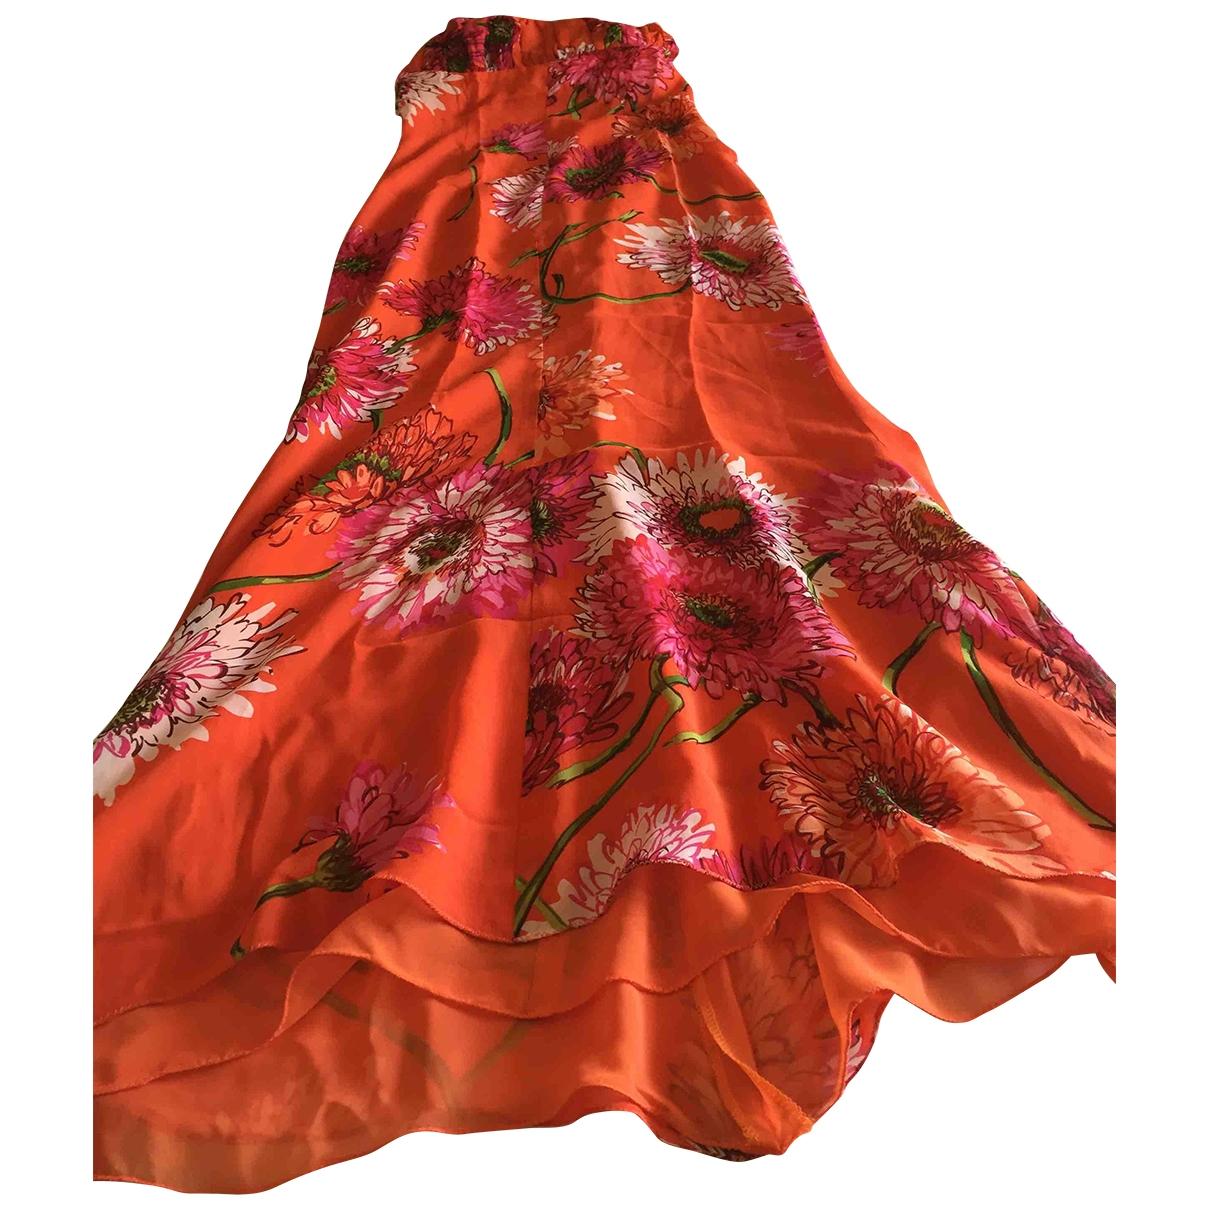 Gio' Guerreri \N Orange dress for Women 42 IT